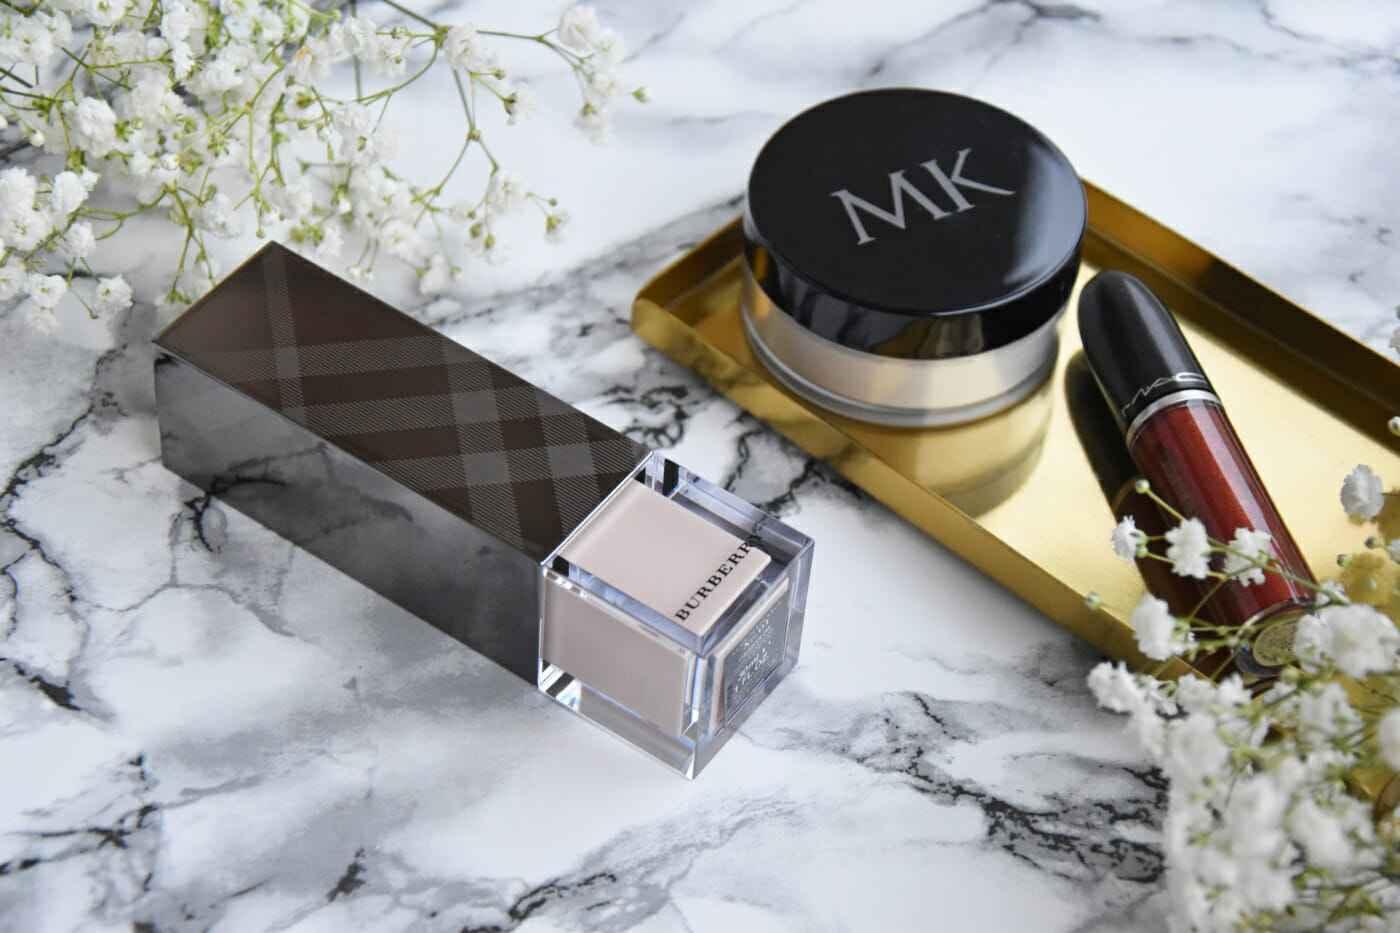 make up lieblinge von burberry mary kay und mac cosmetics. Black Bedroom Furniture Sets. Home Design Ideas